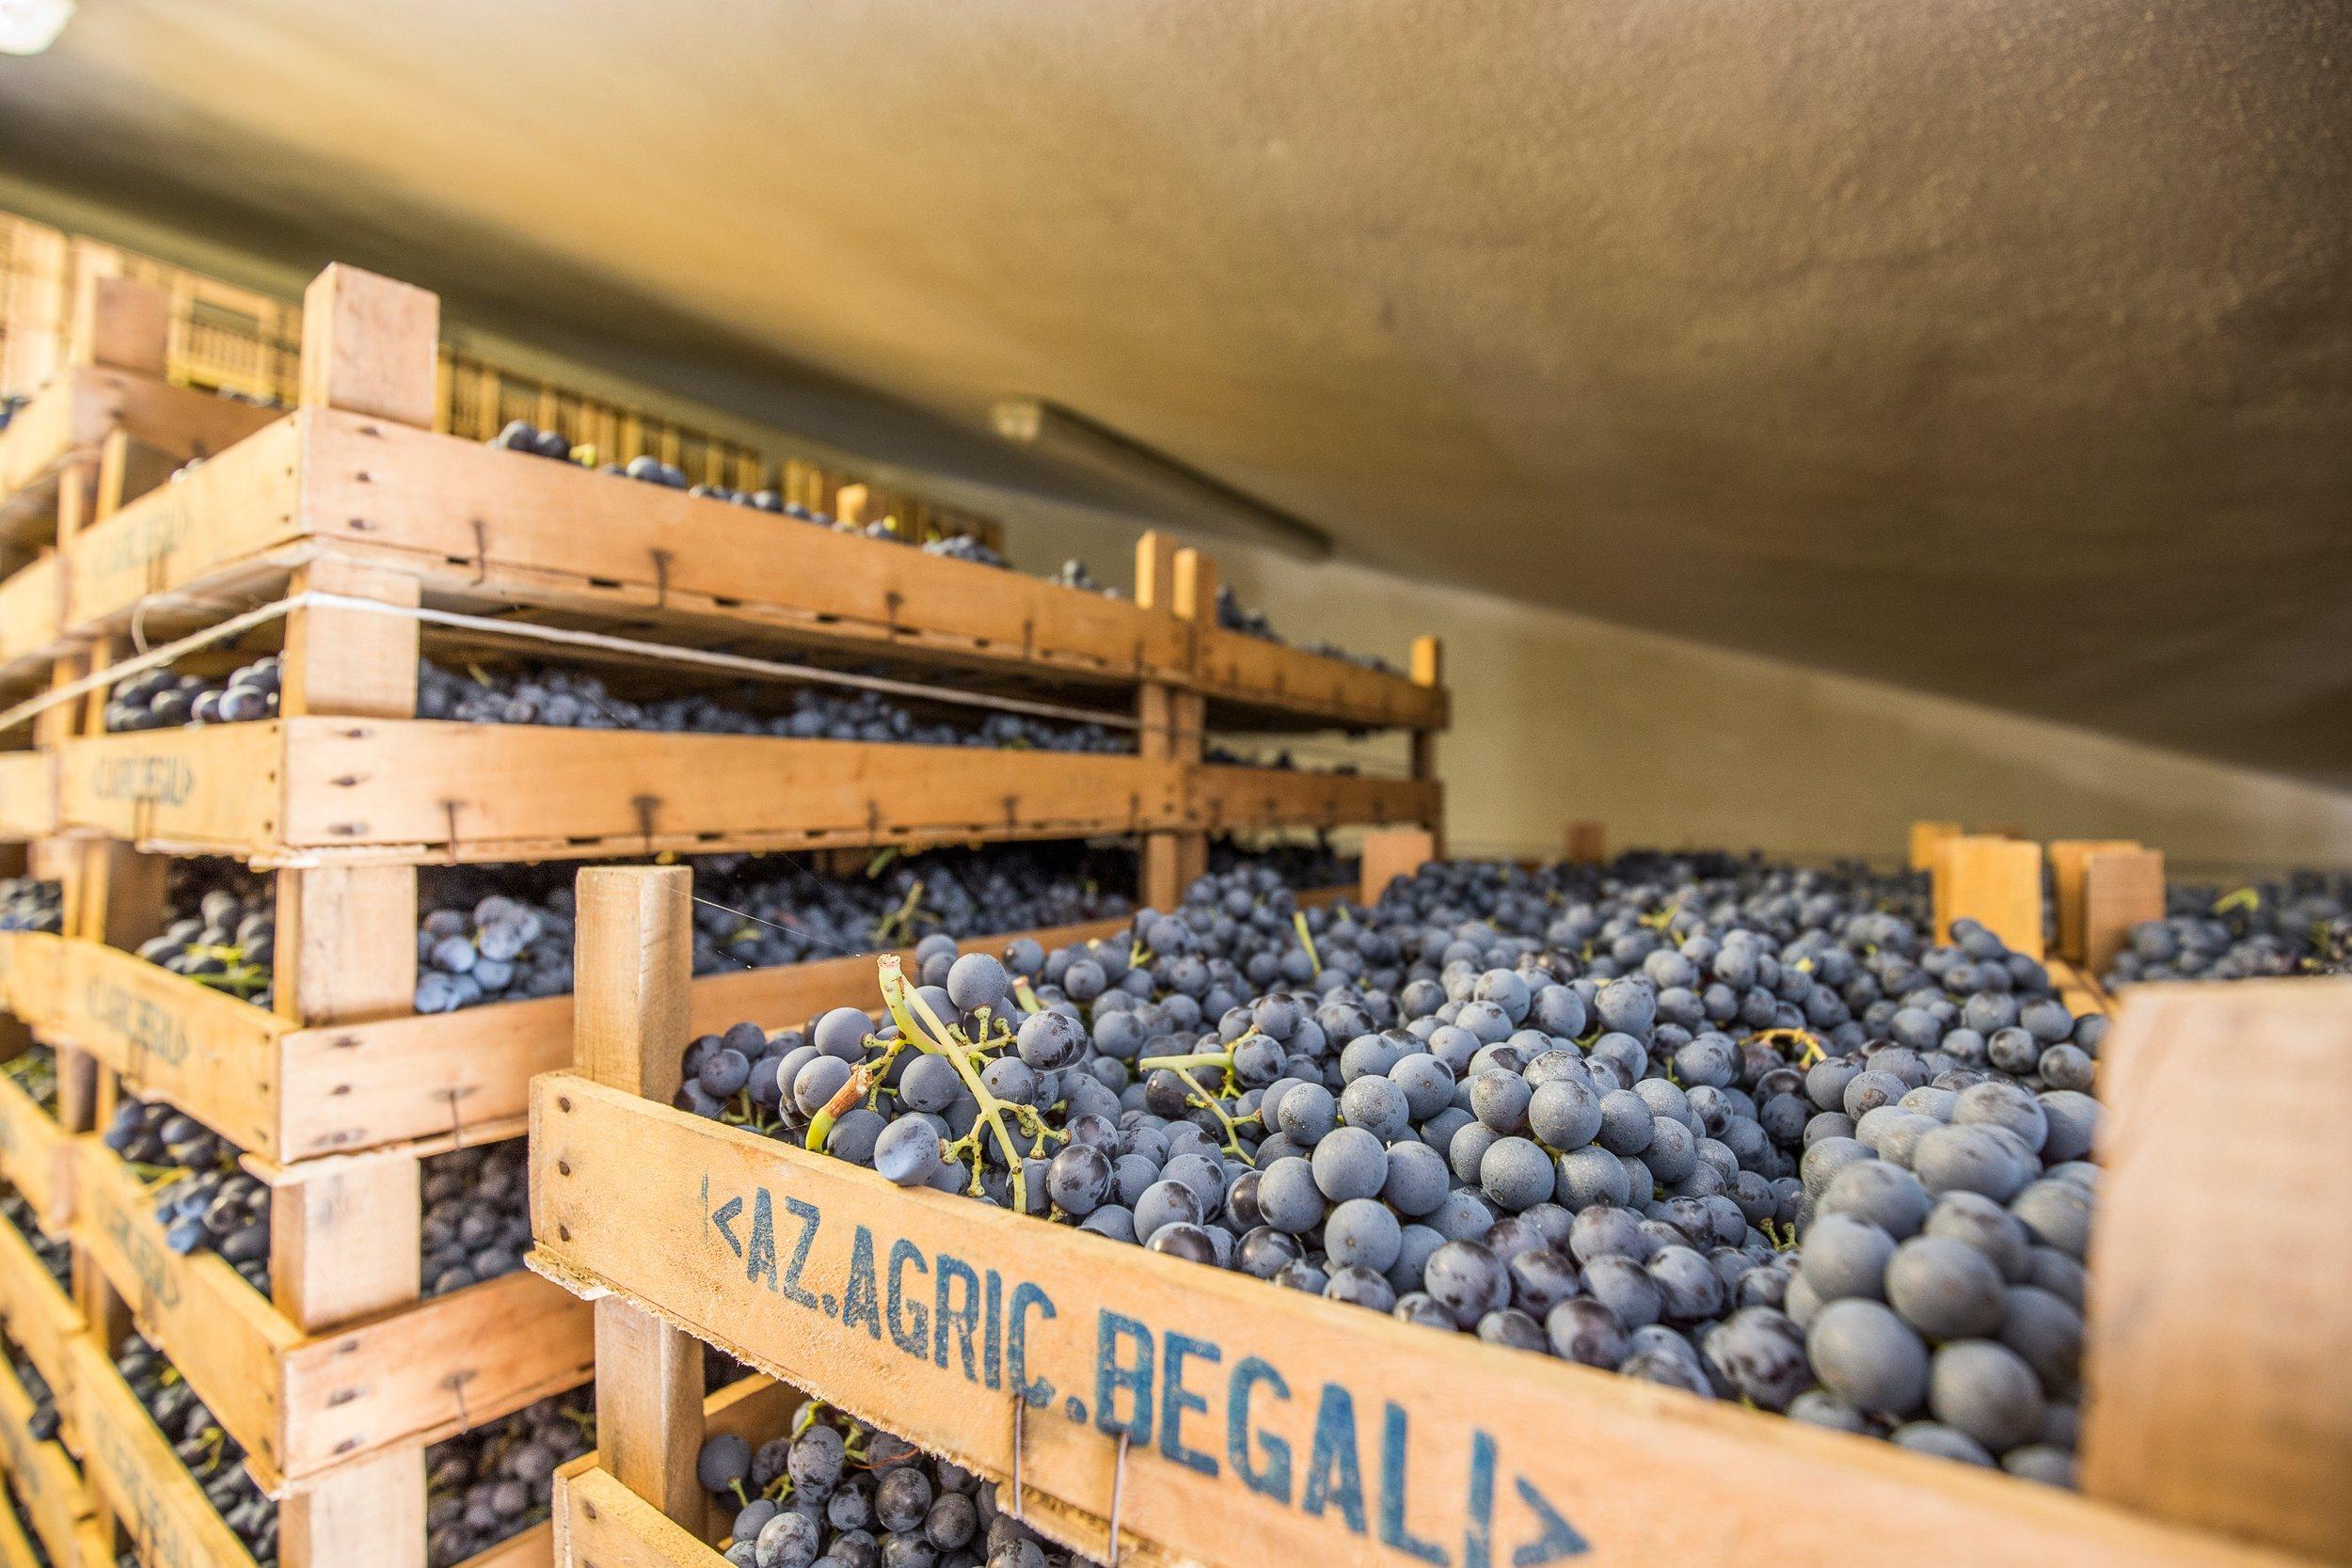 Begali grapes photo 1.JPG